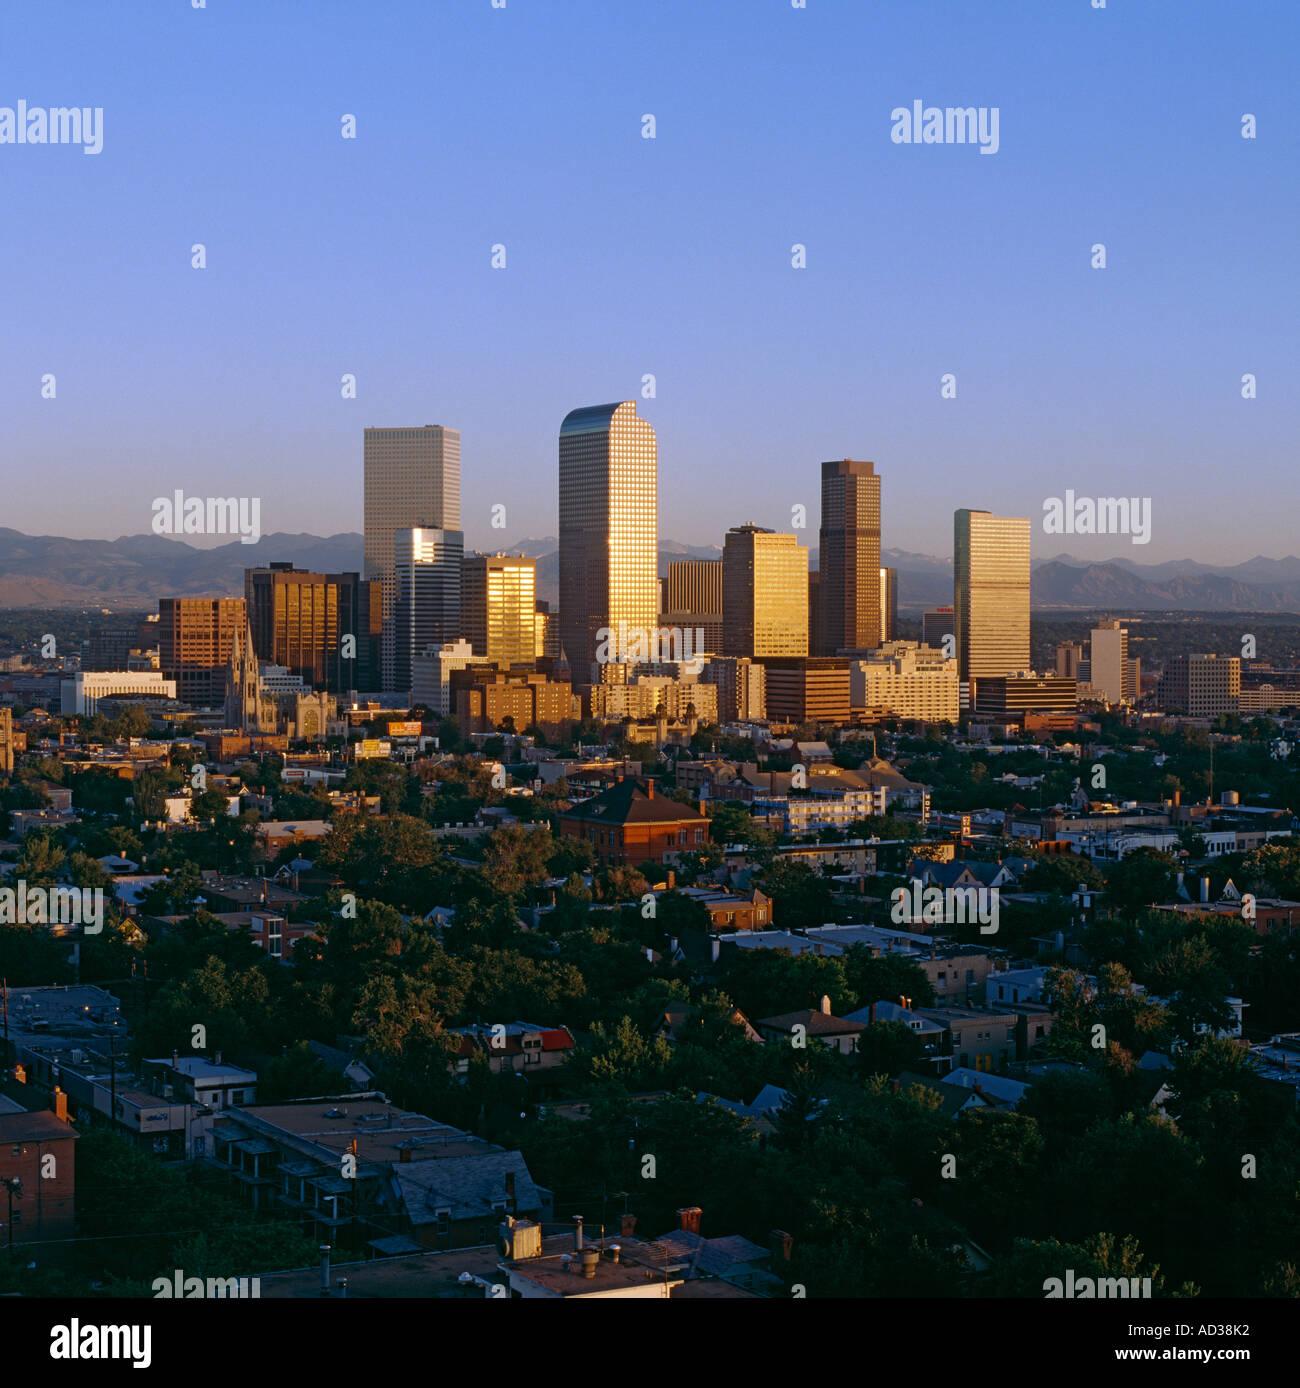 Skyline Of Denver, Colorado, USA At Sunrise With The Rocky